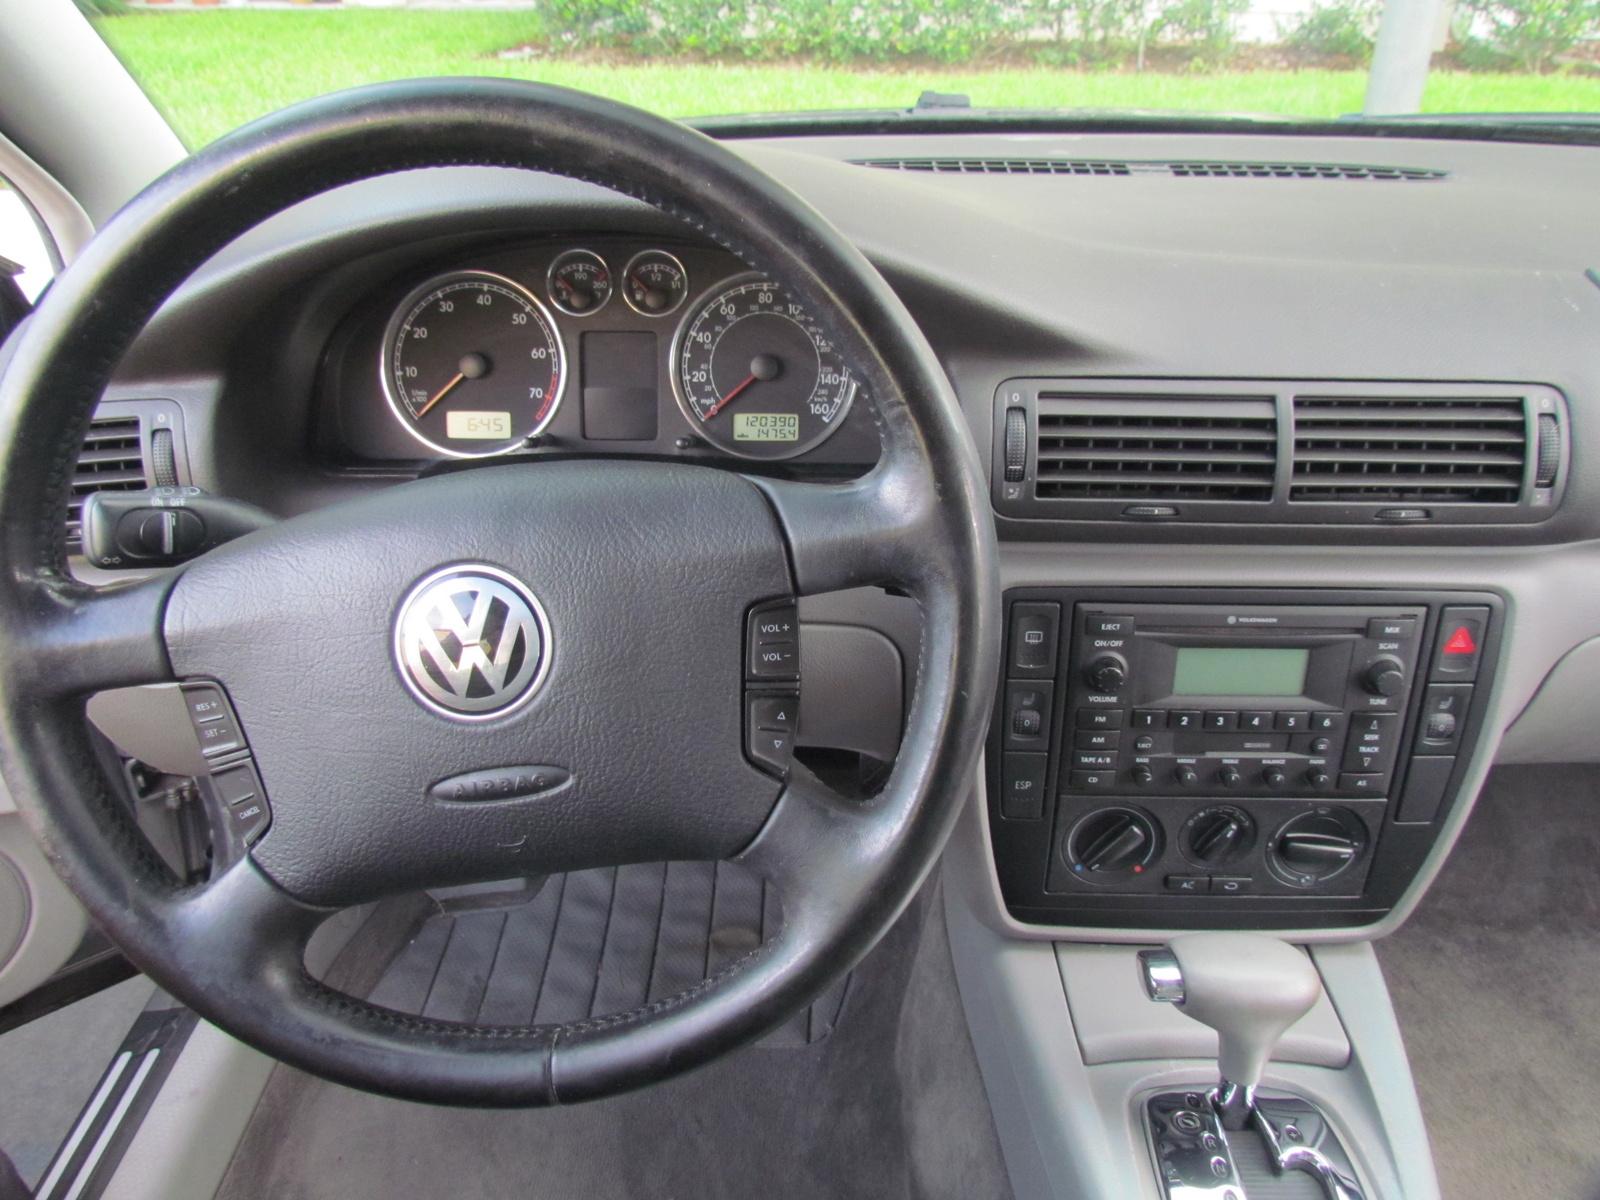 2003 Volkswagen Passat Interior Pictures Cargurus